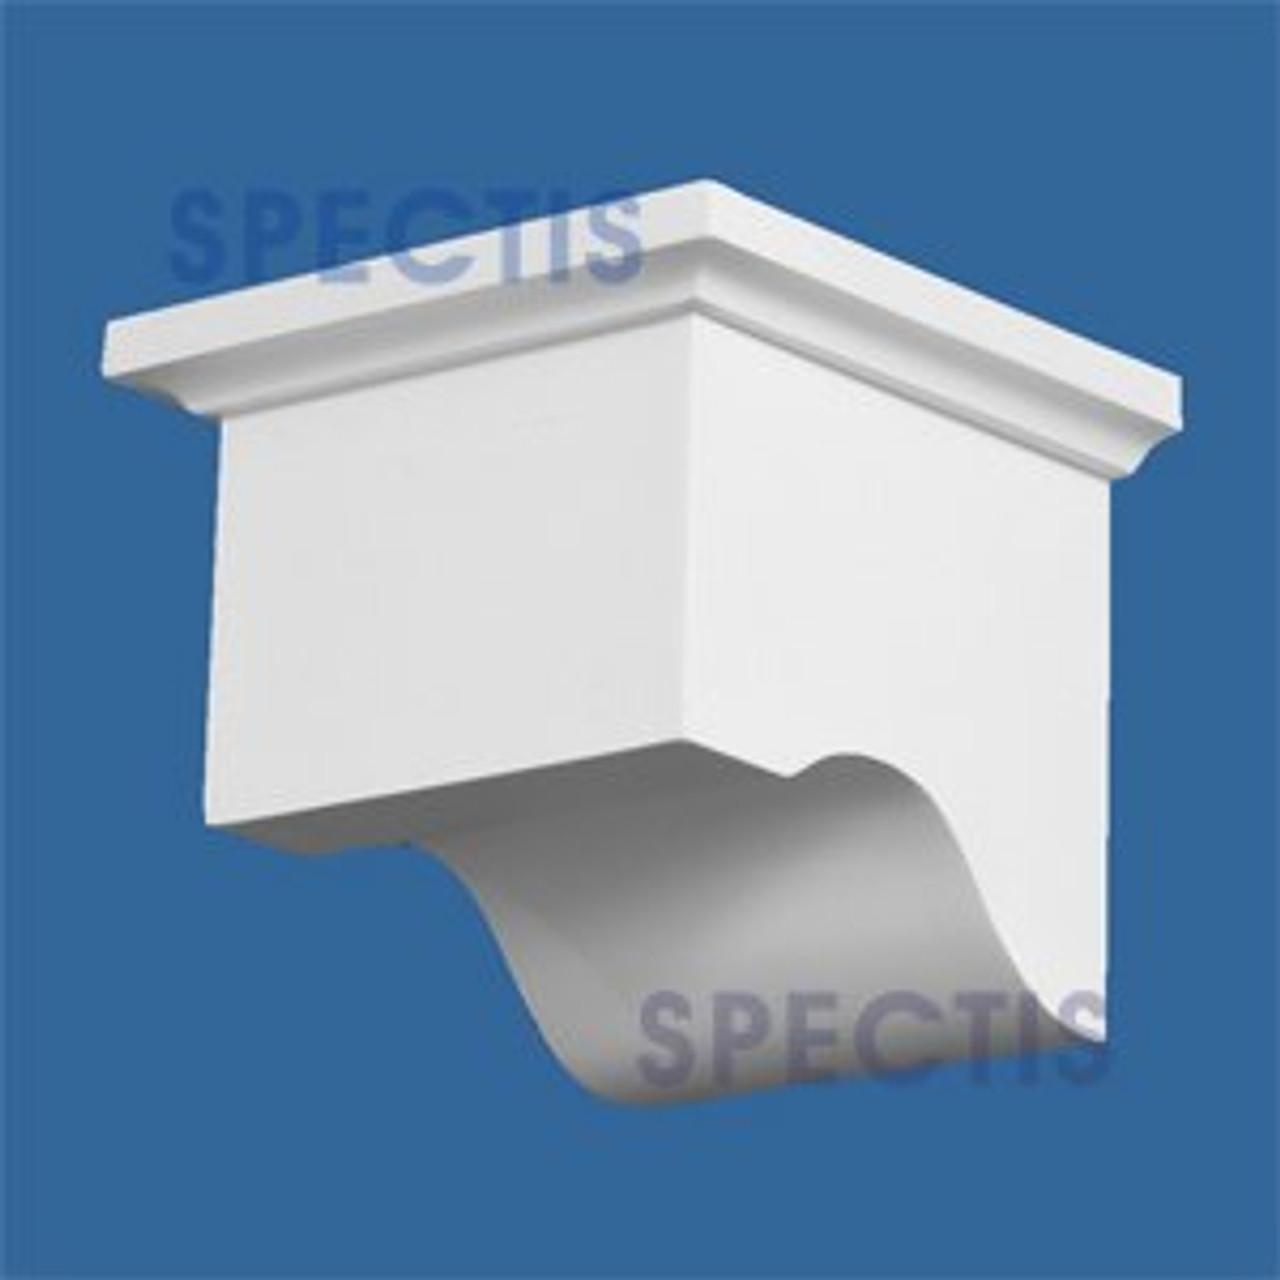 "BL2652 Corbel Block or Eave Bracket 4.5""W x 4""H x 4.5"" P"